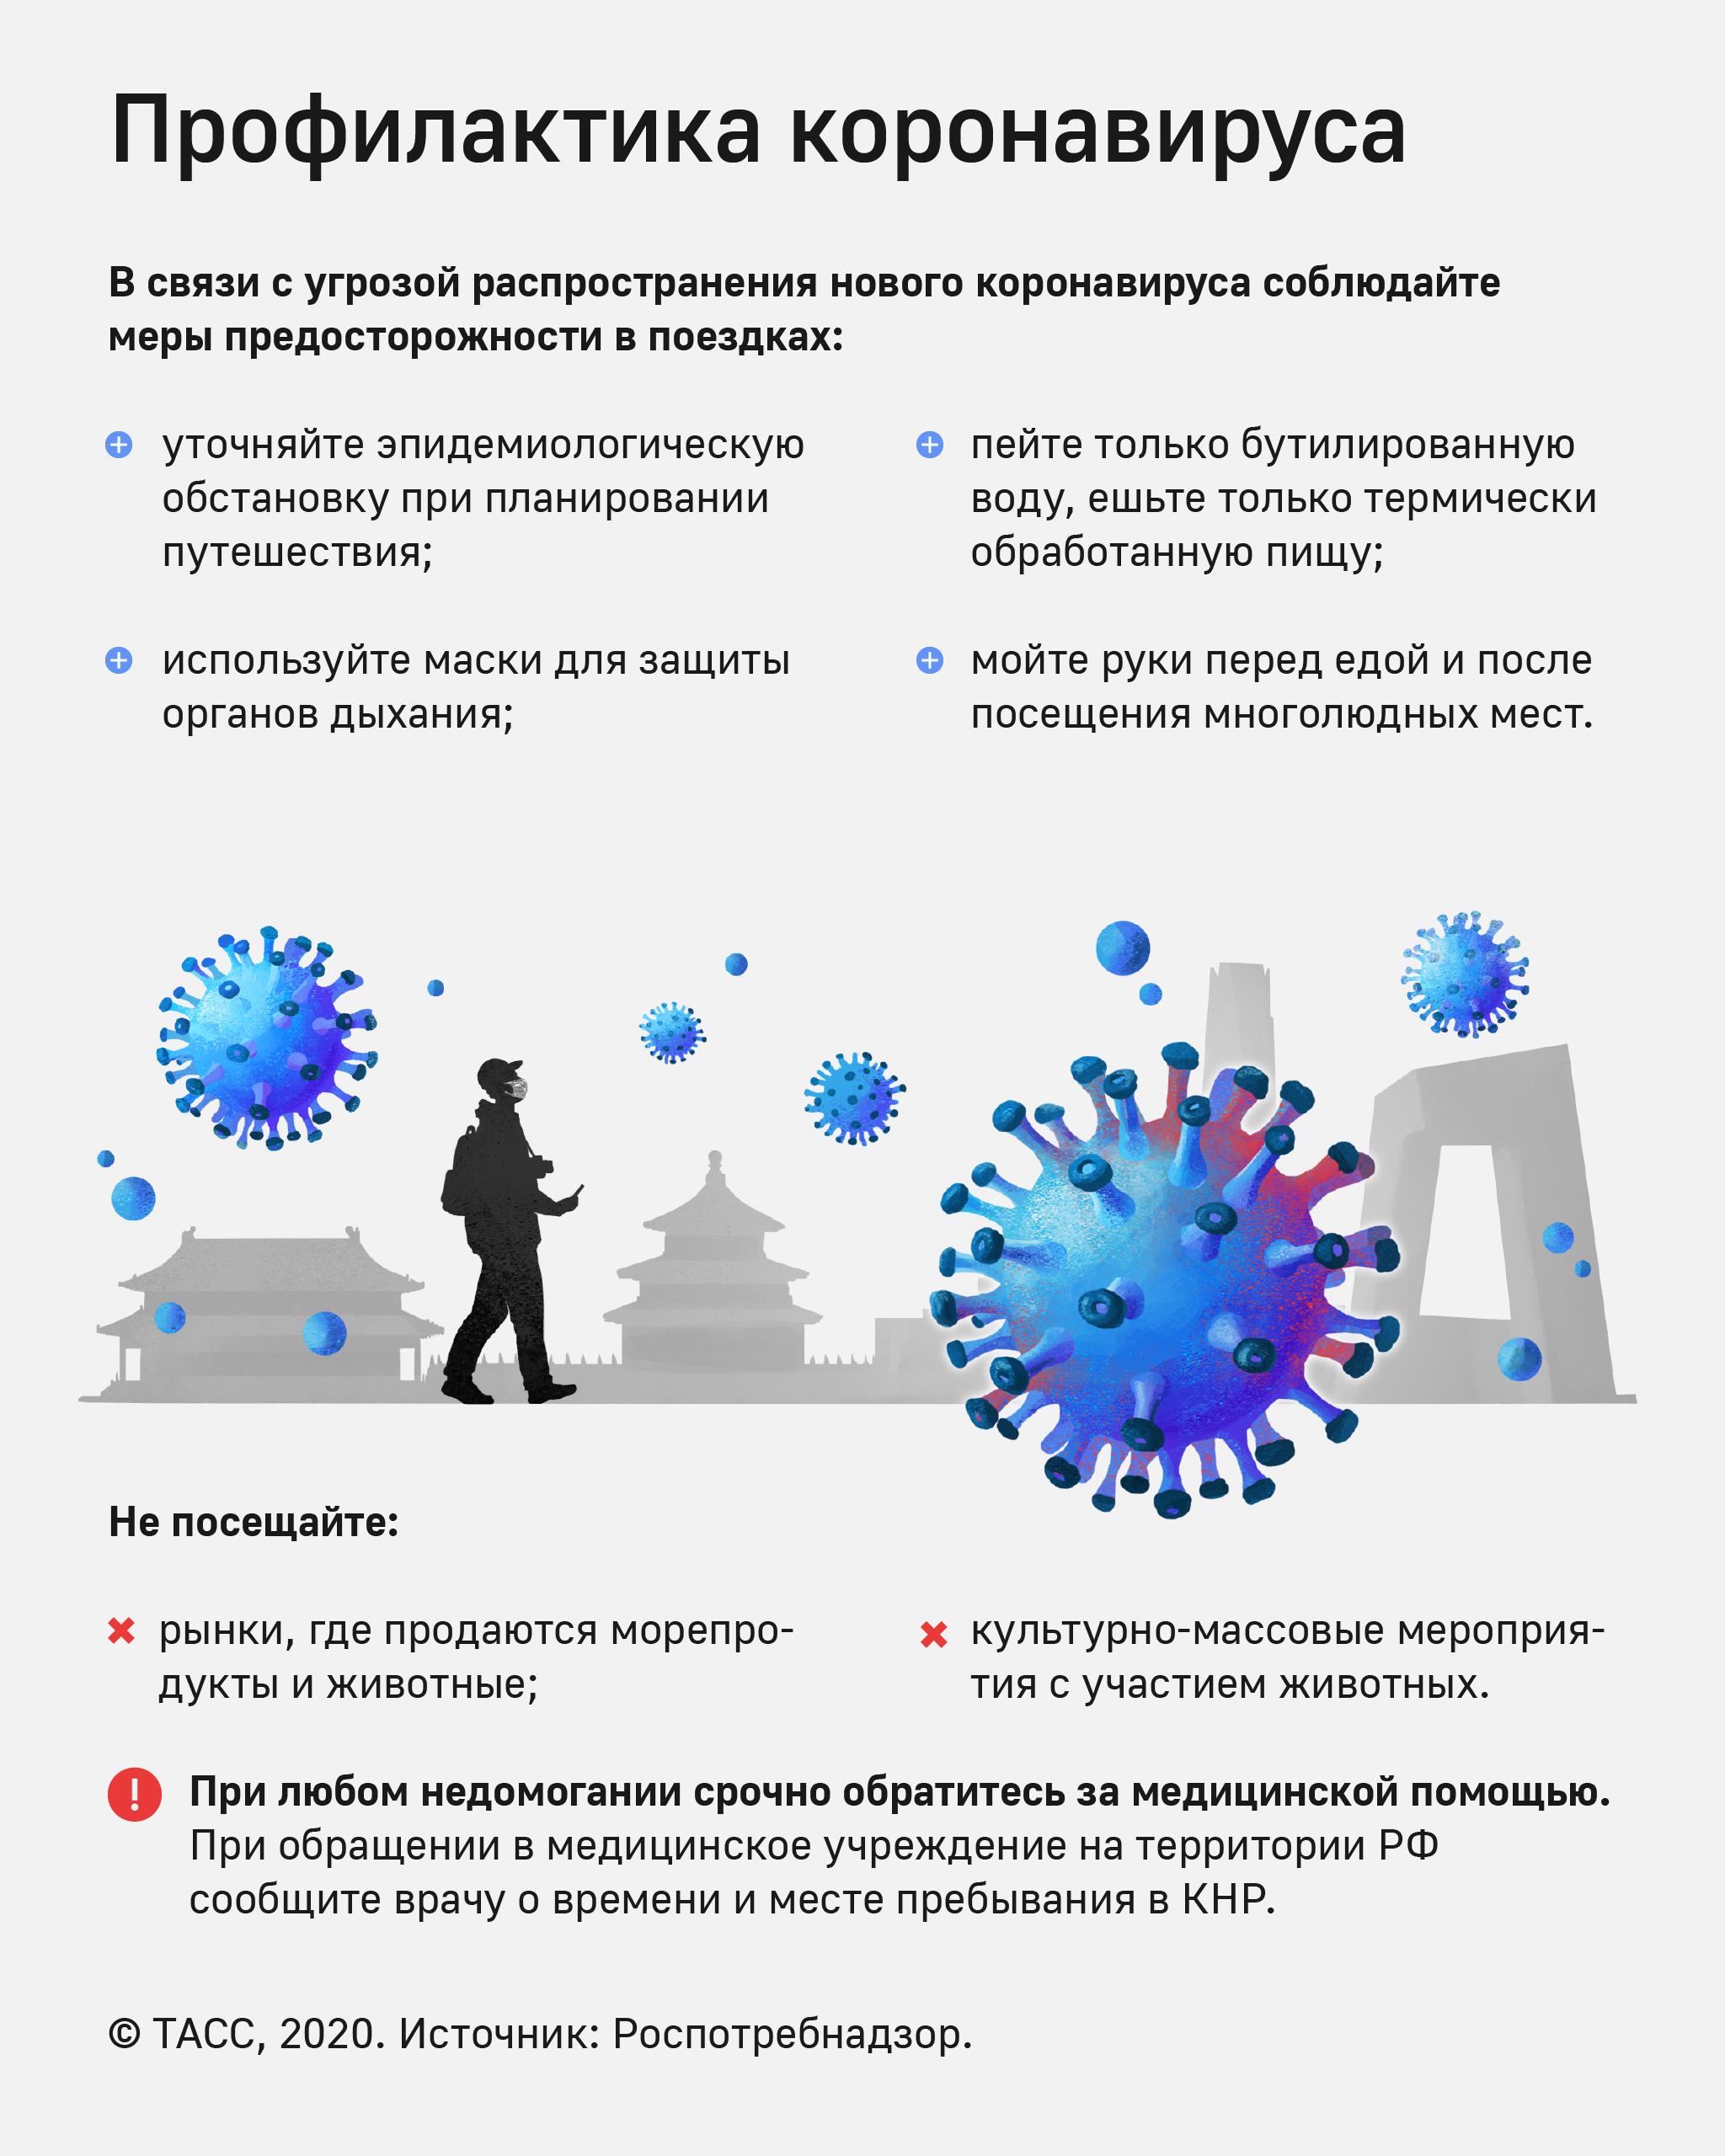 эпидемиология коронавирусов